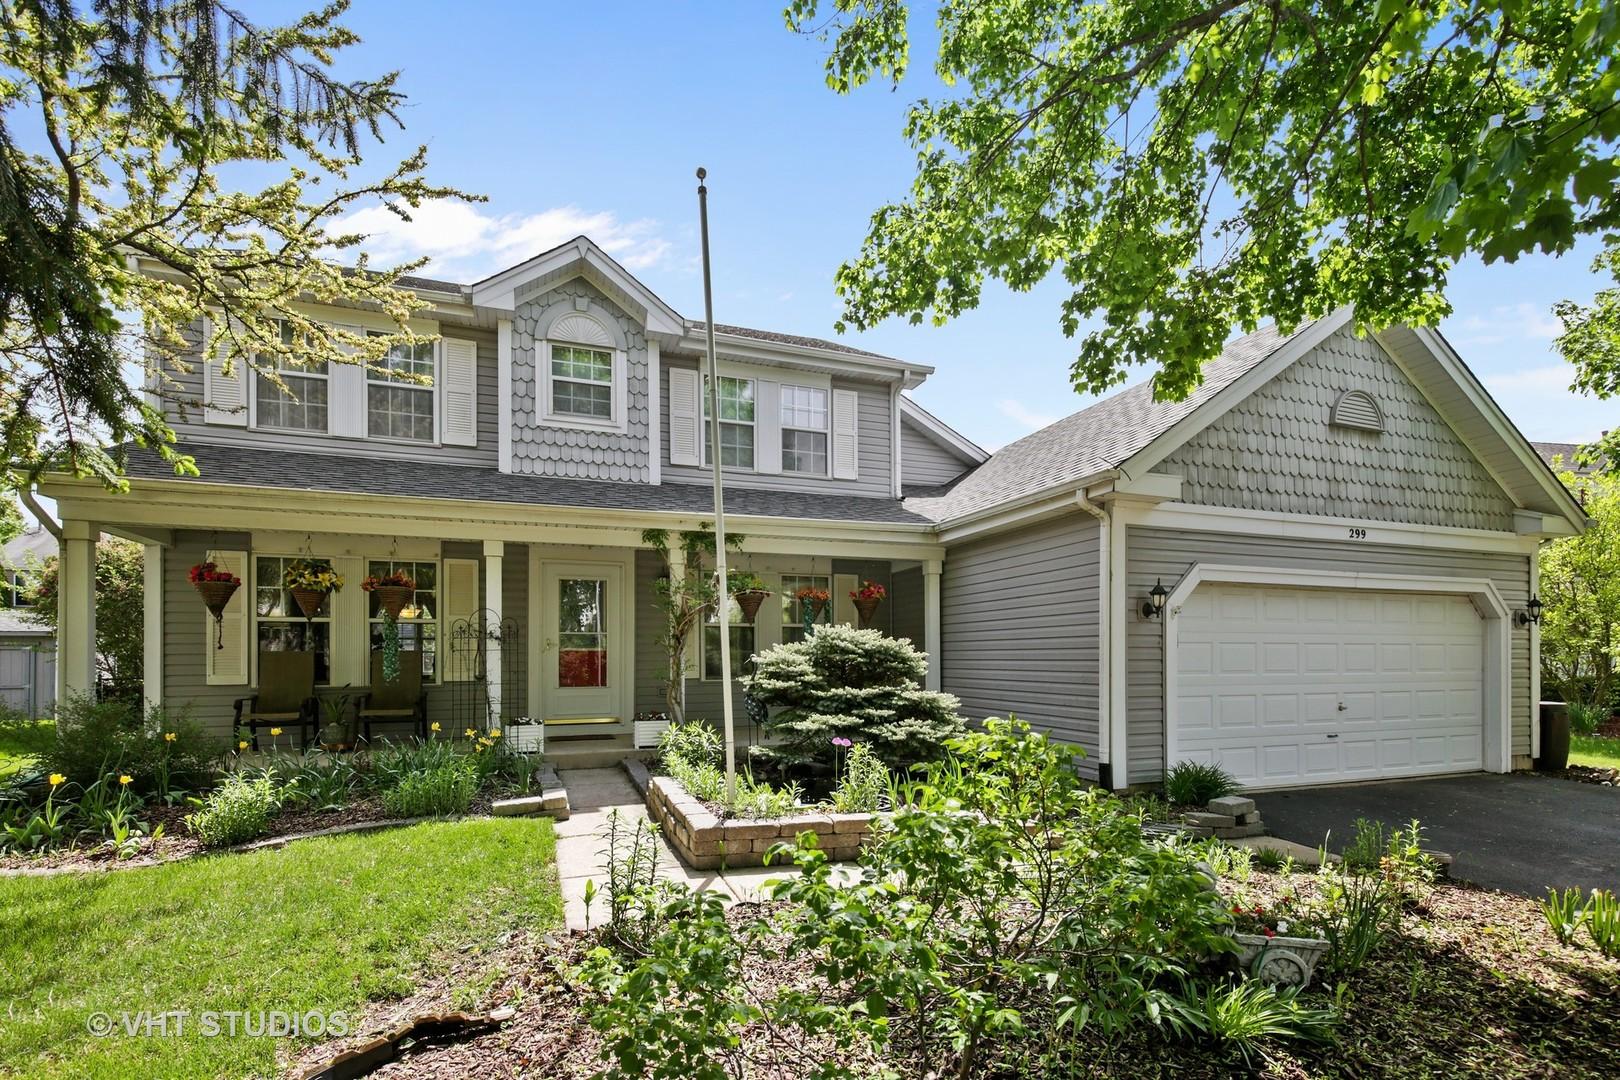 299 Mayfair Lane, South Elgin, Illinois 60177